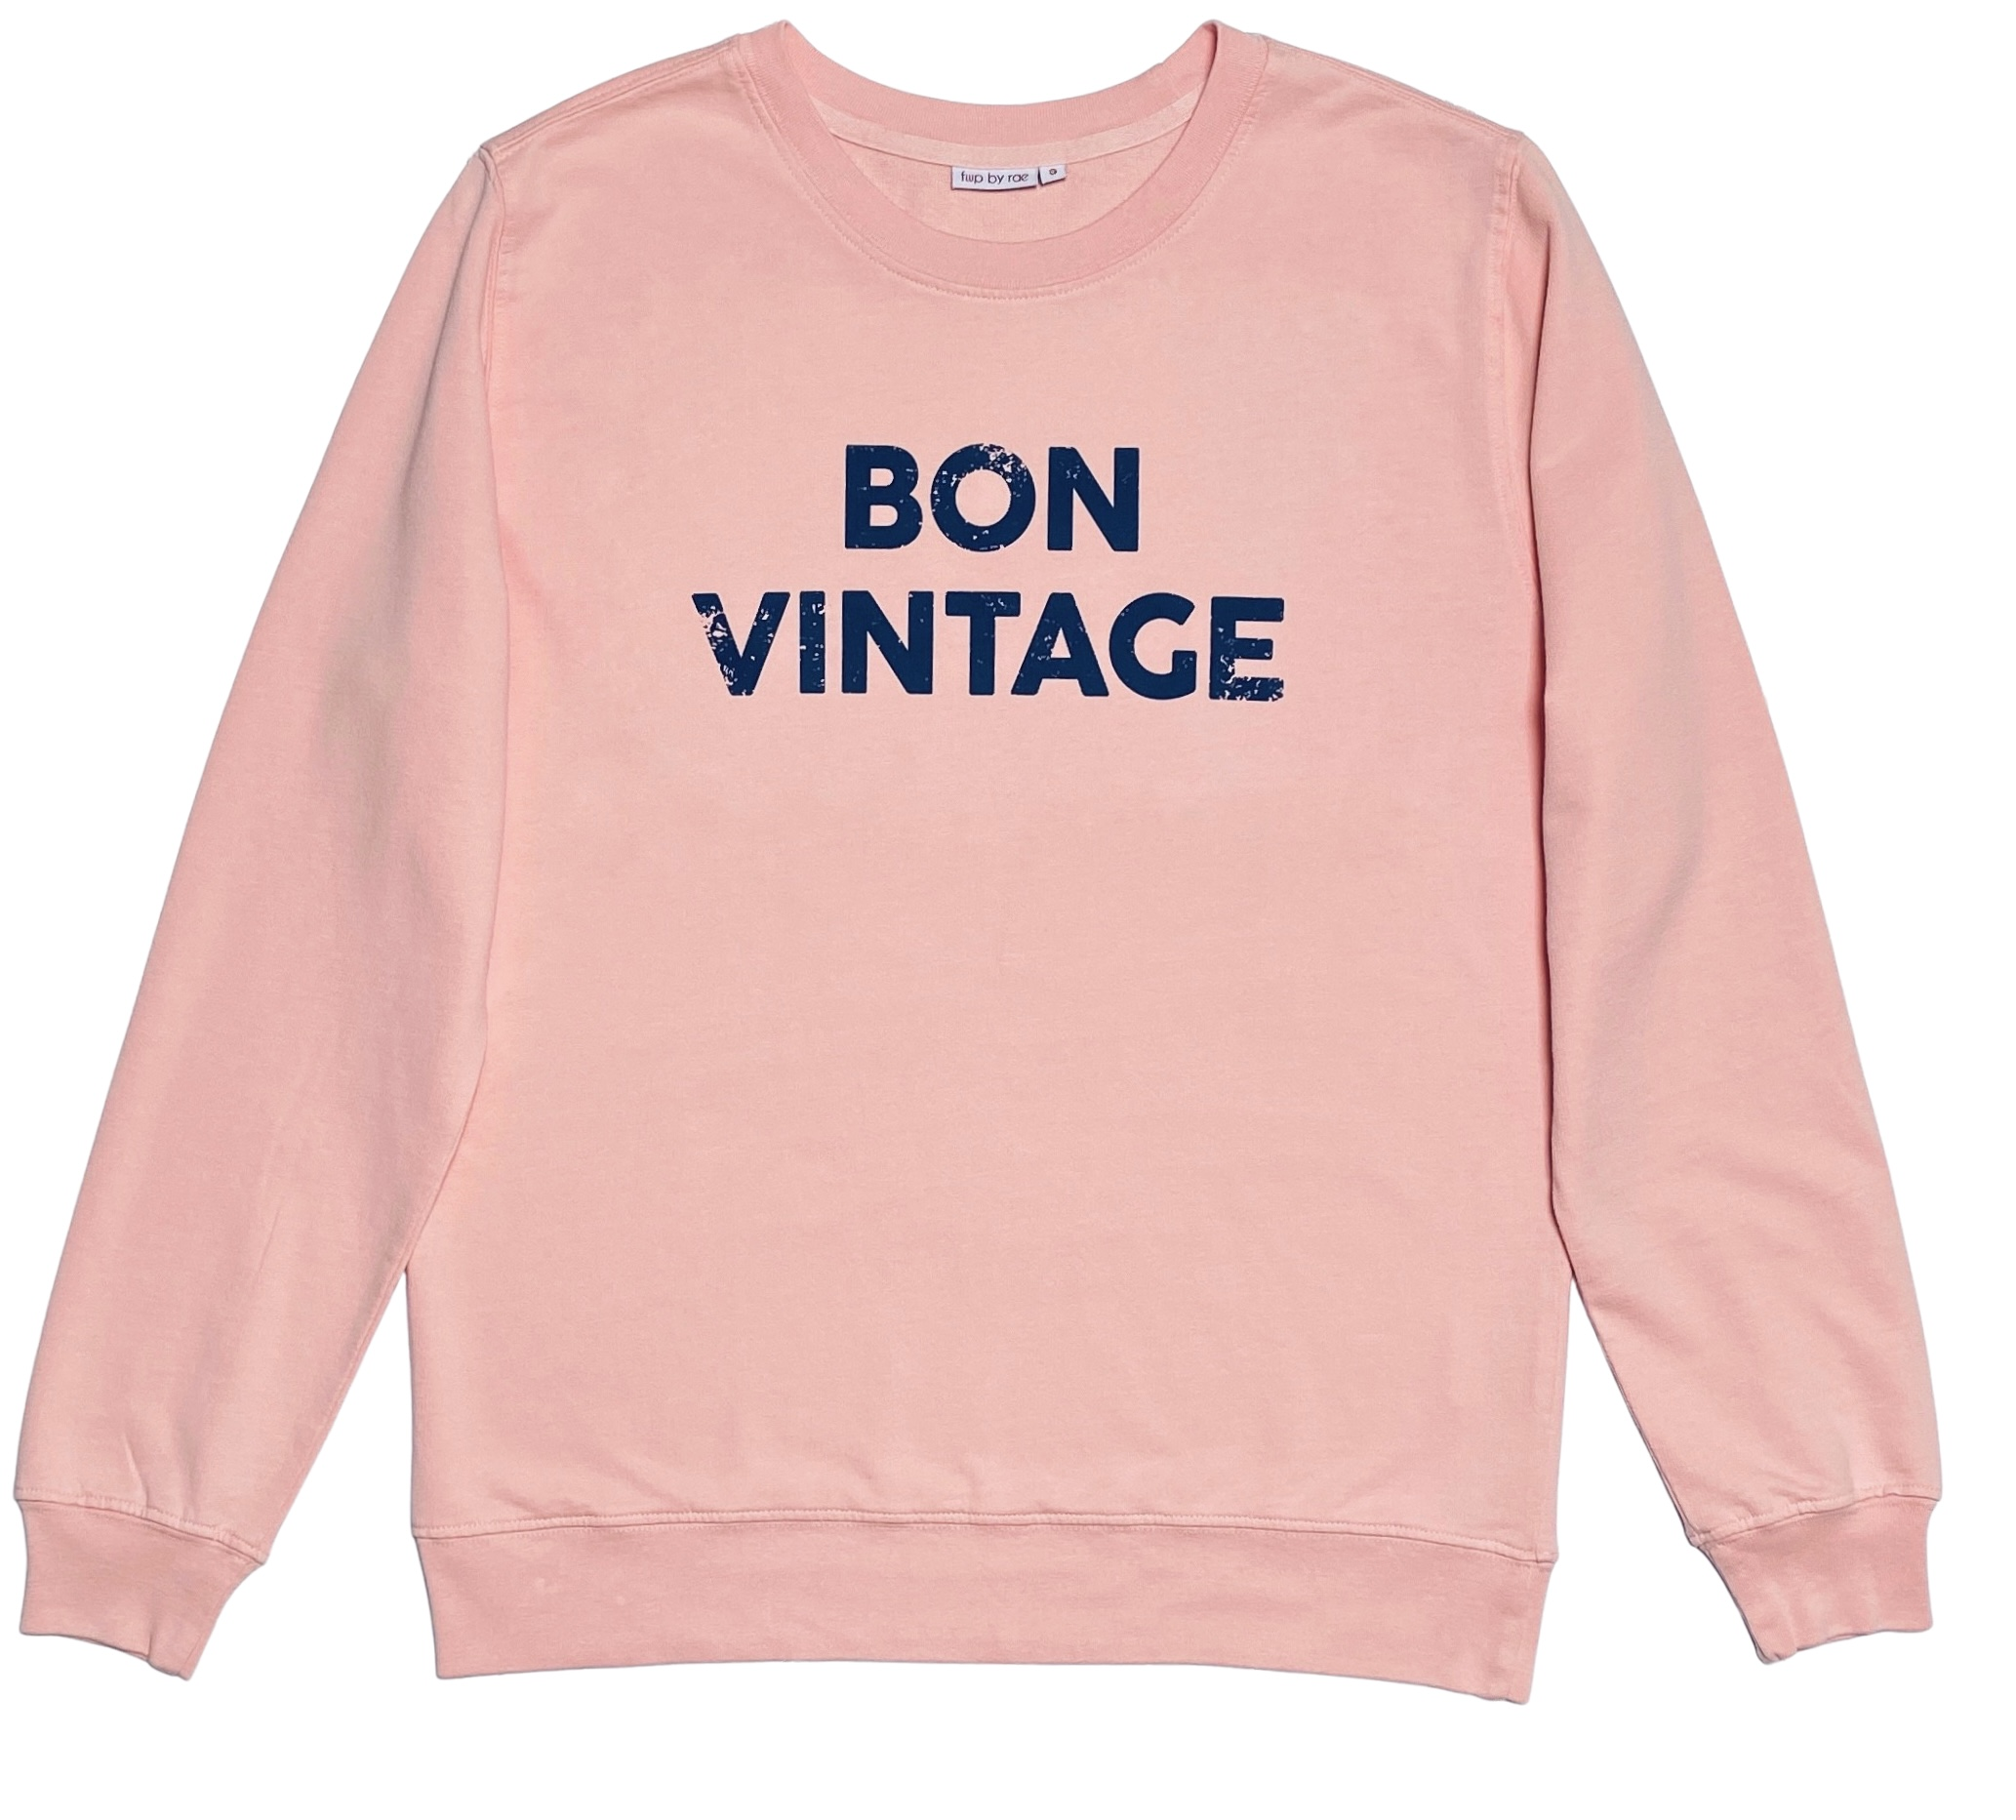 bon vintage sweatshirt